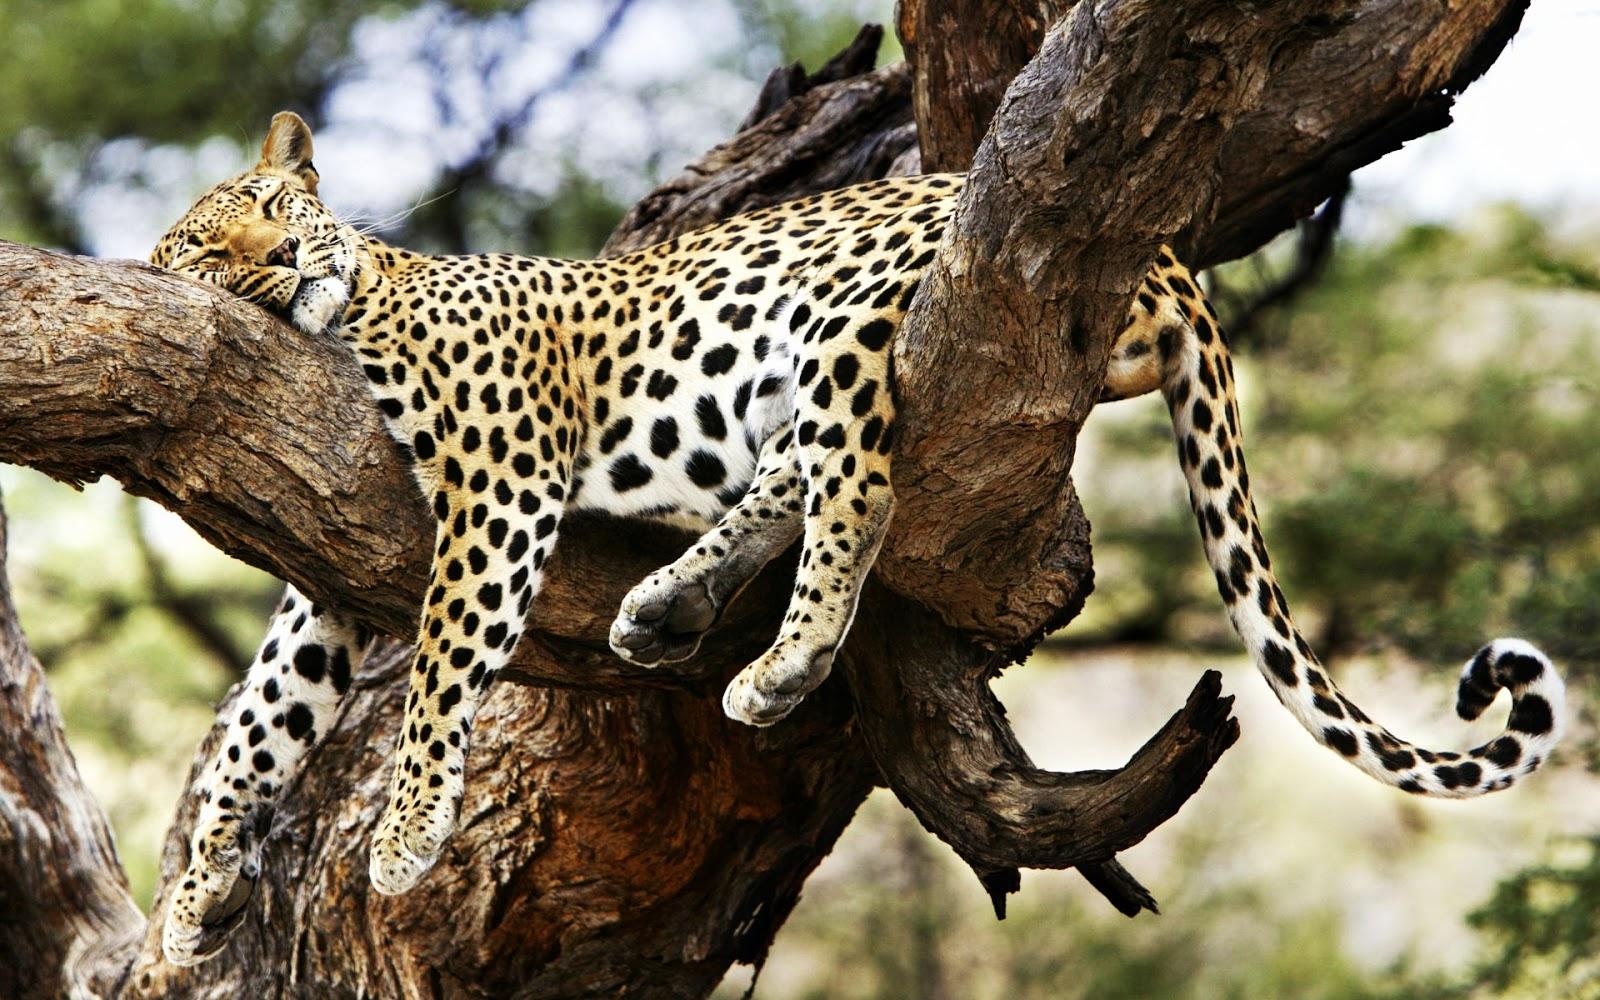 10 Gambar Hewan Liar Tidur Gambar Top 10